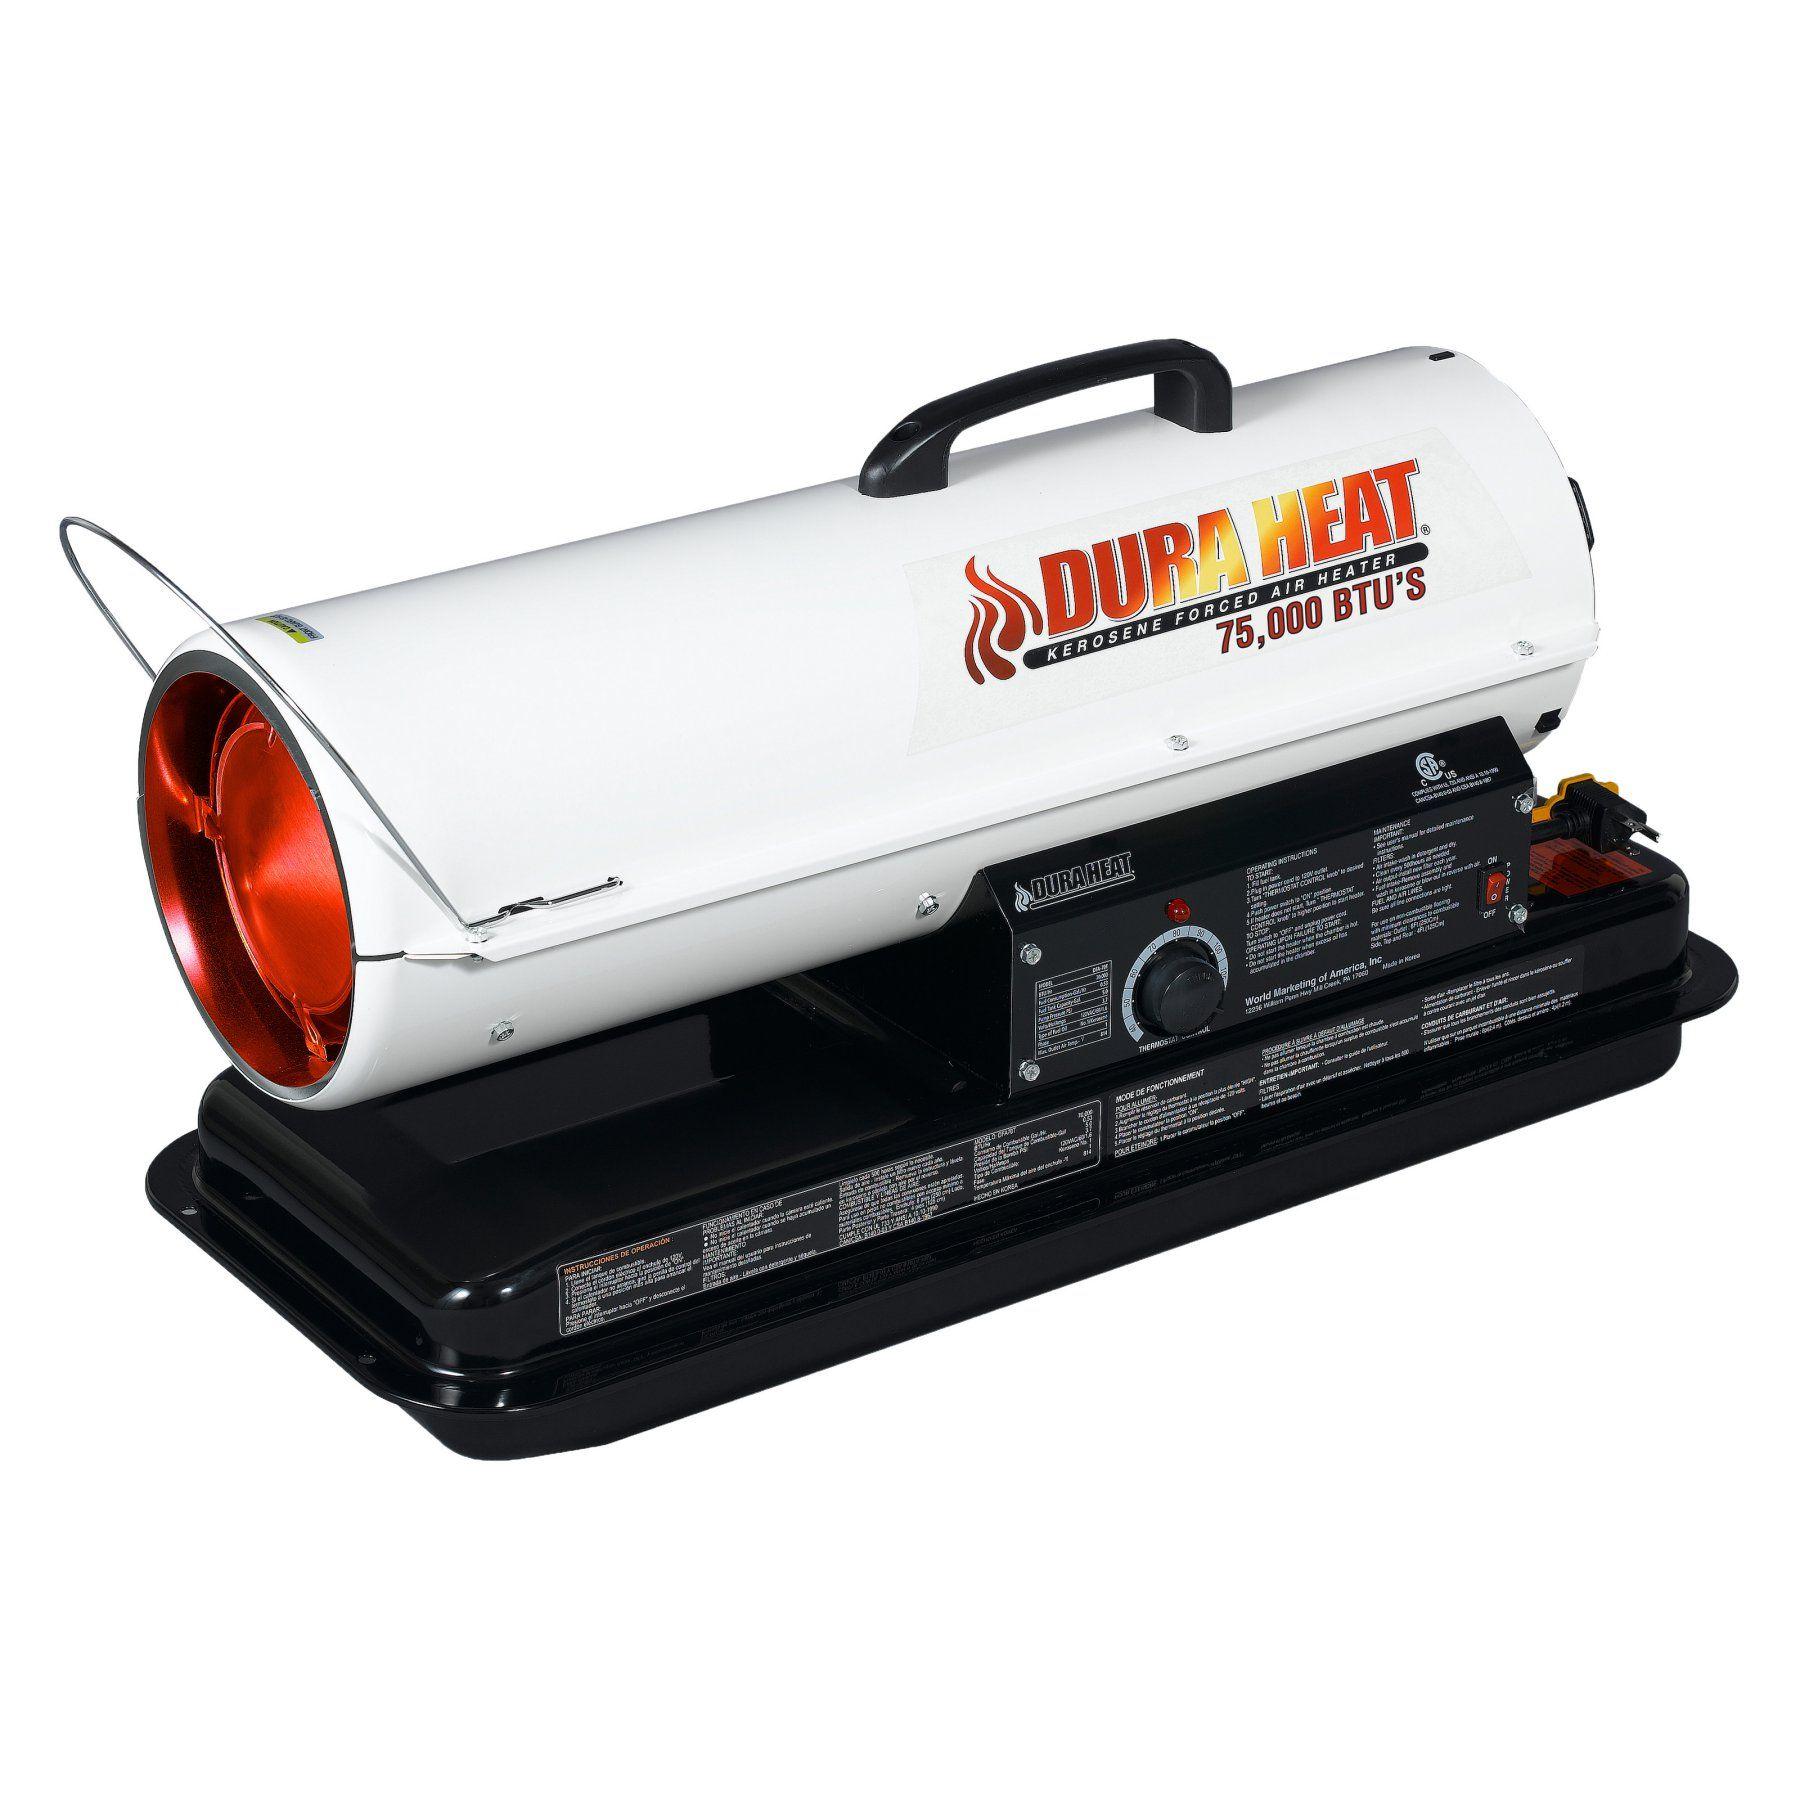 Dura Heat Heavy Duty Forced Air Utility Heater 80,000